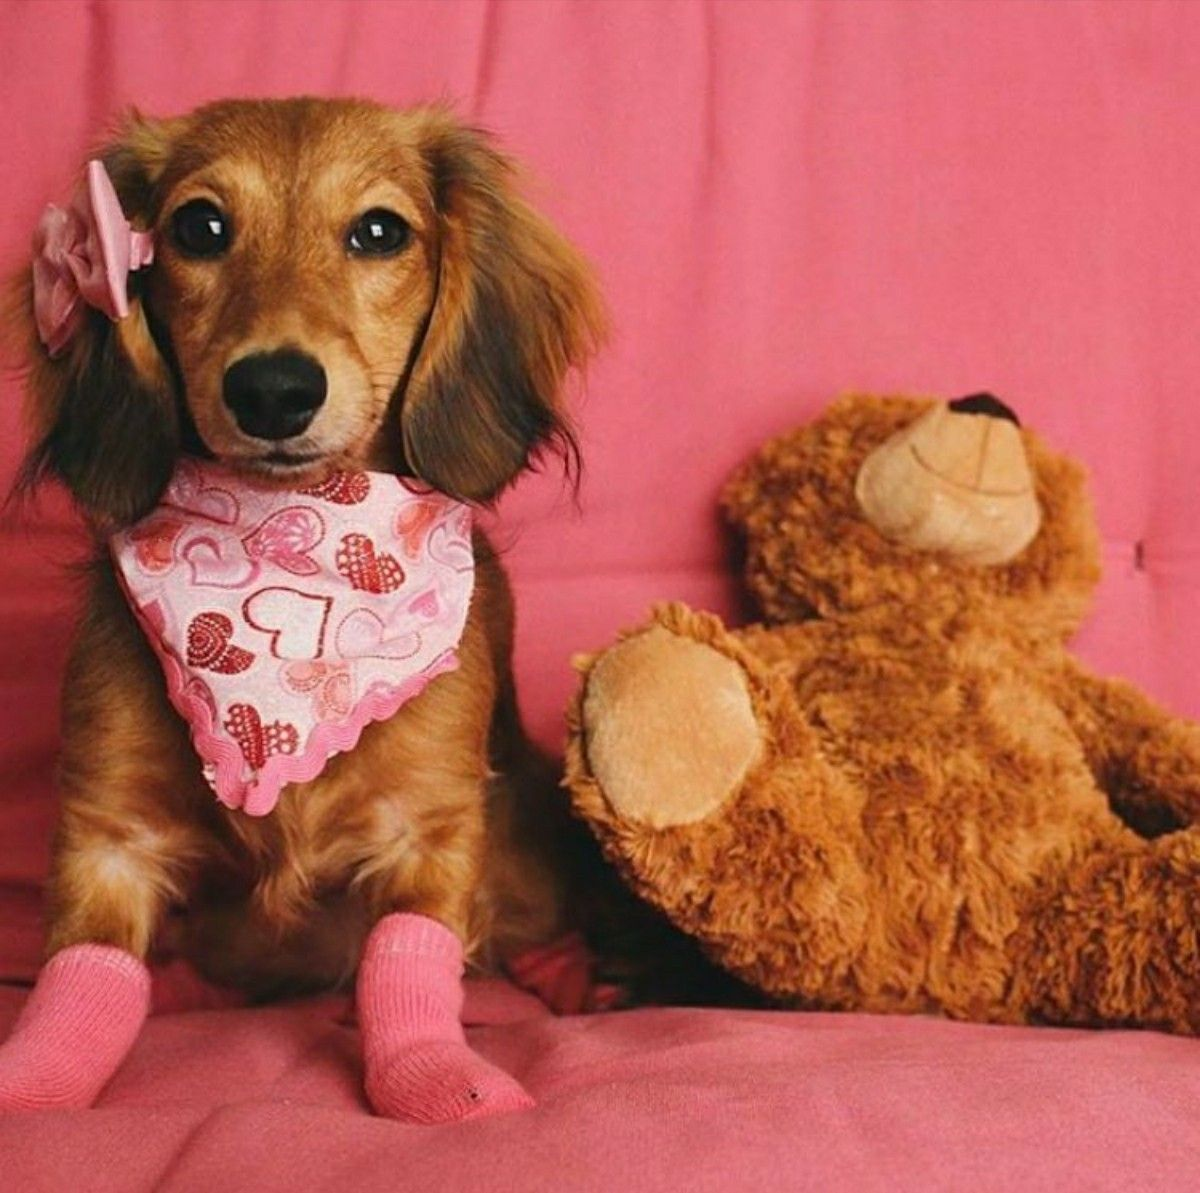 Dachshund longhaired dachshund food animals doggy